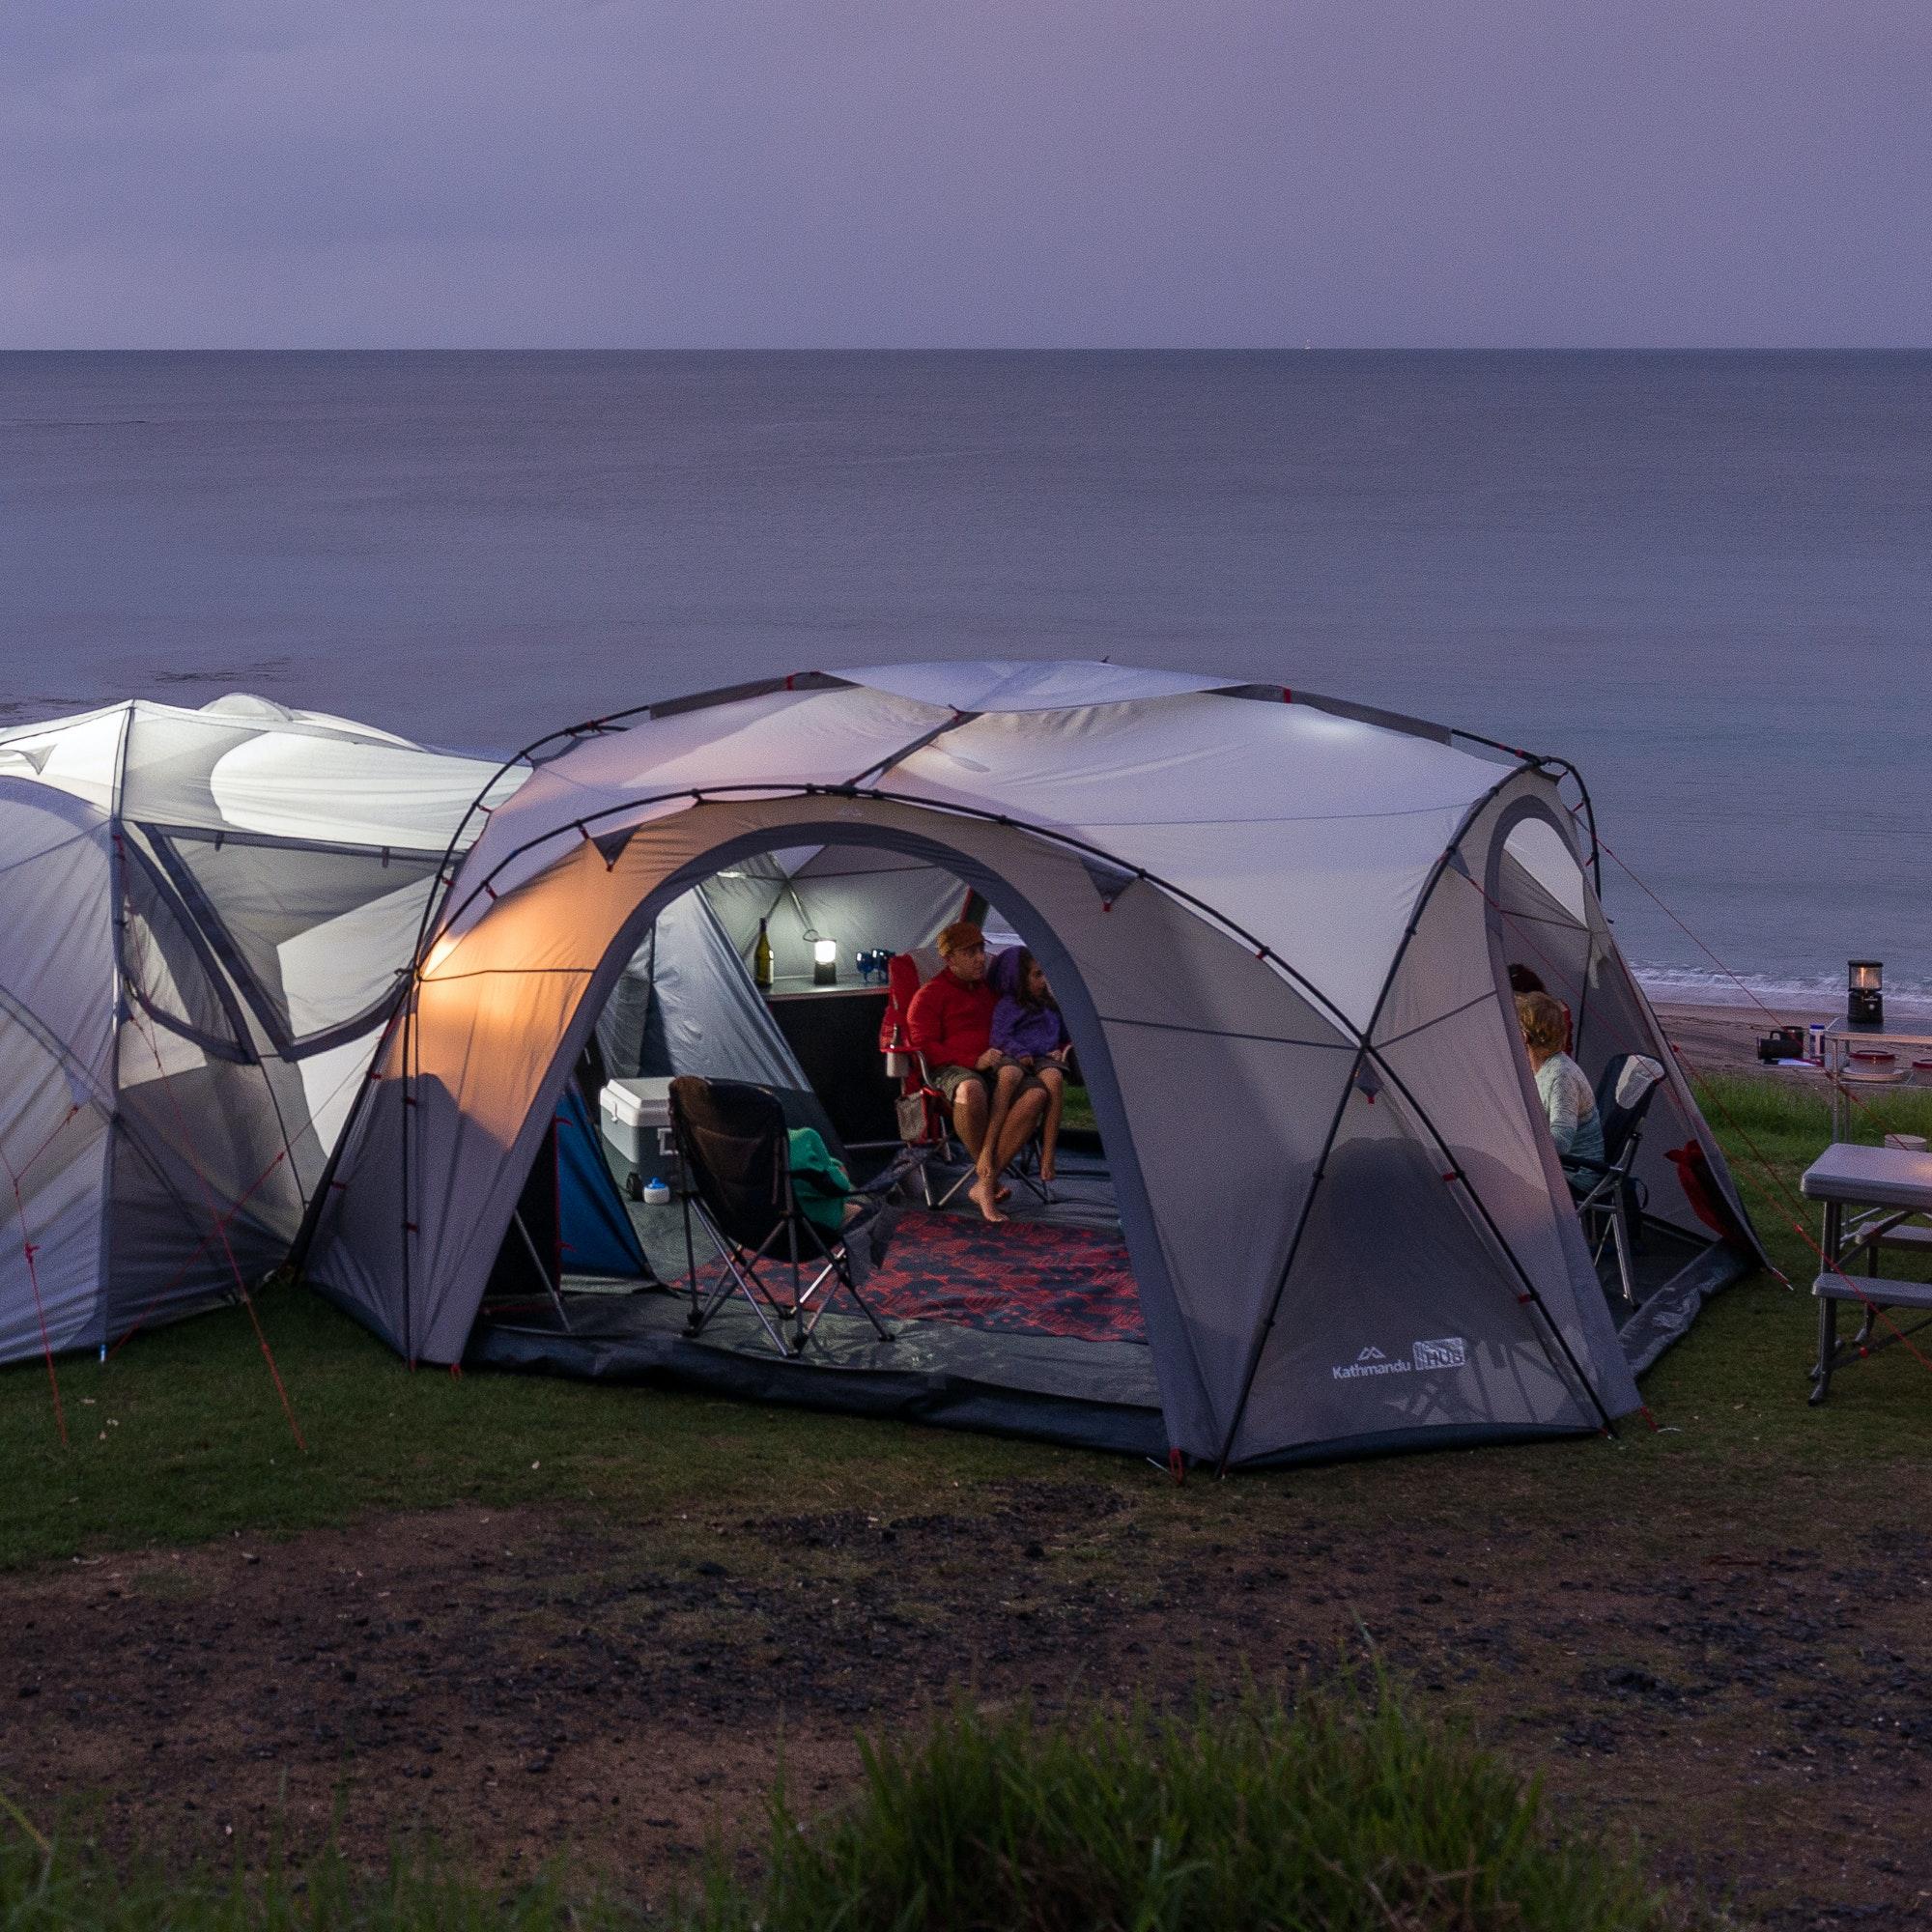 H42 & Retreat 320 6 Person Module Tent - Dark Navy/Cloud